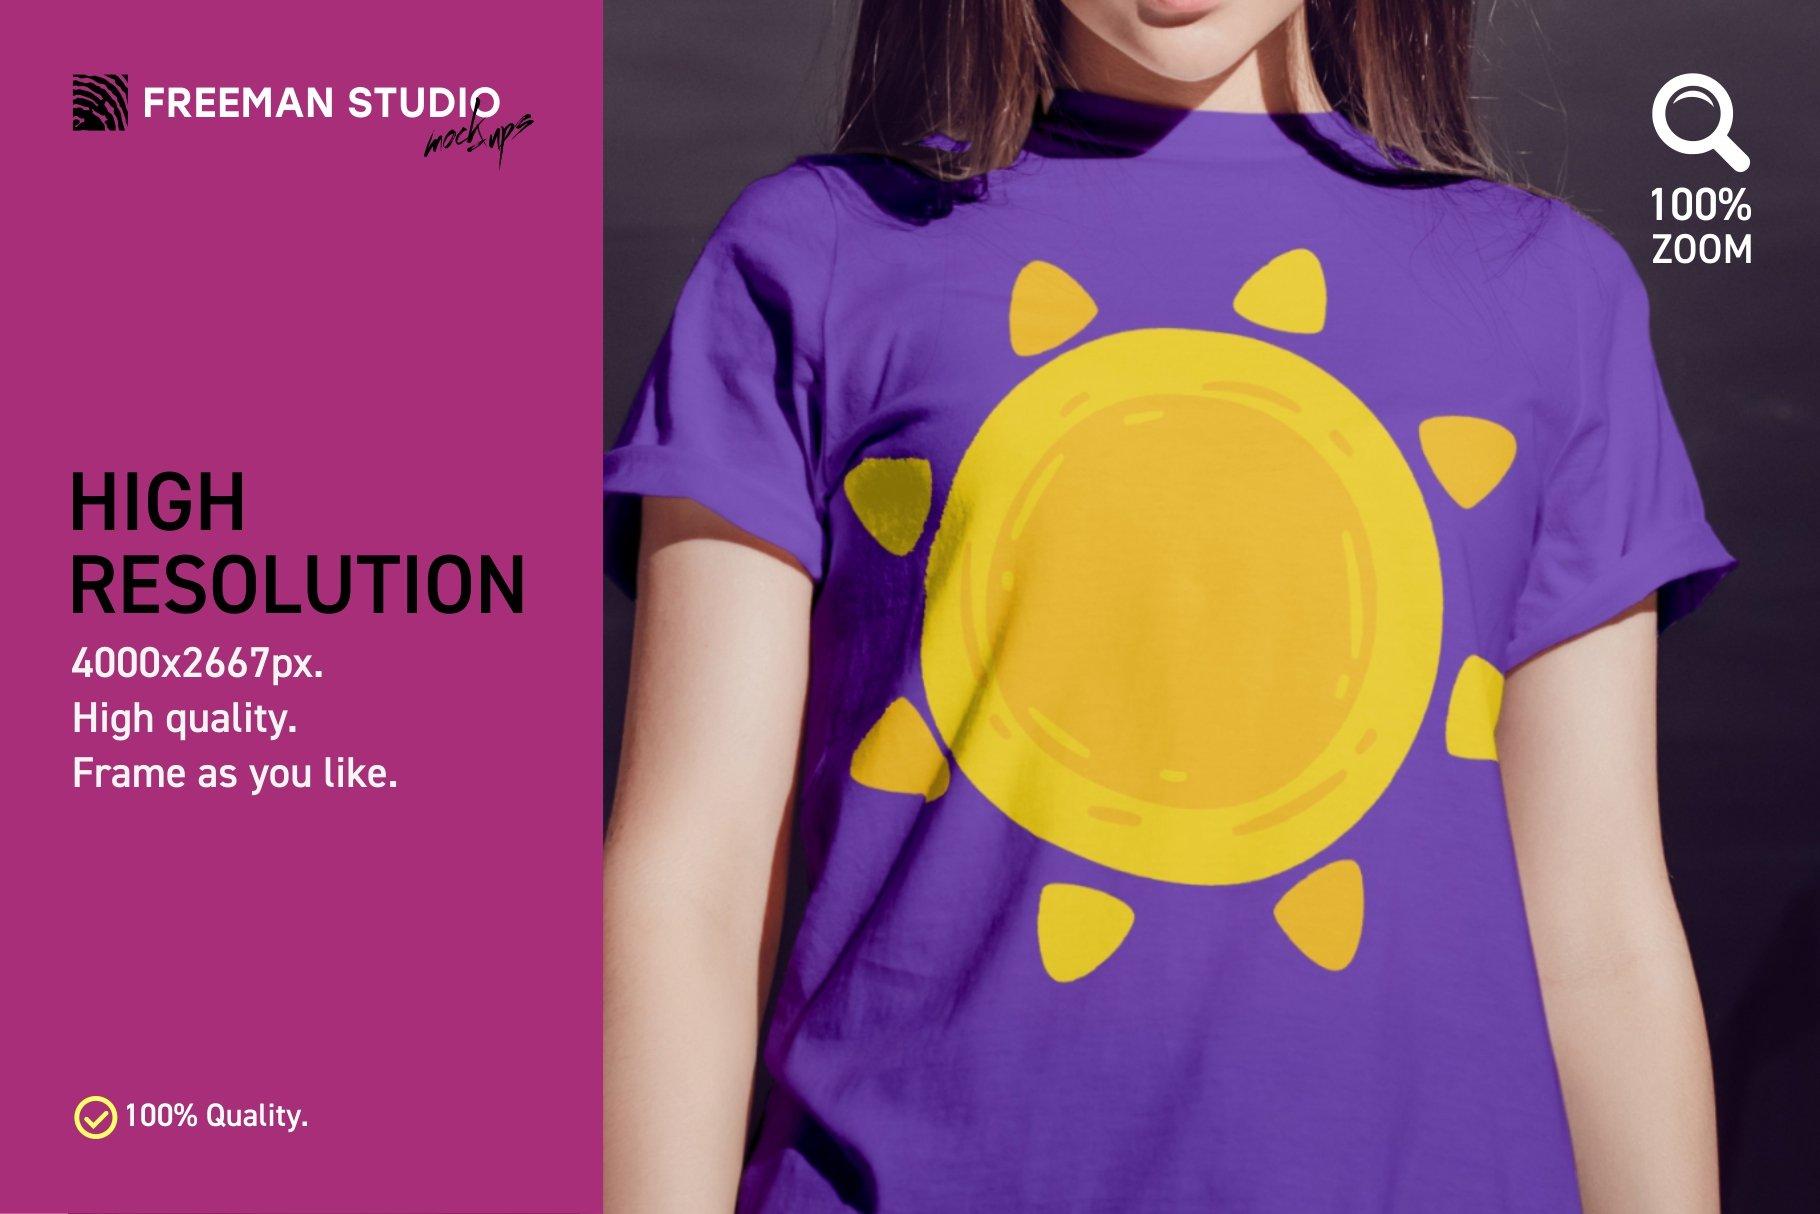 青少年T恤半袖衫印花图案设计展示样机合集 Teenager T-Shirt Mockup Set插图(3)